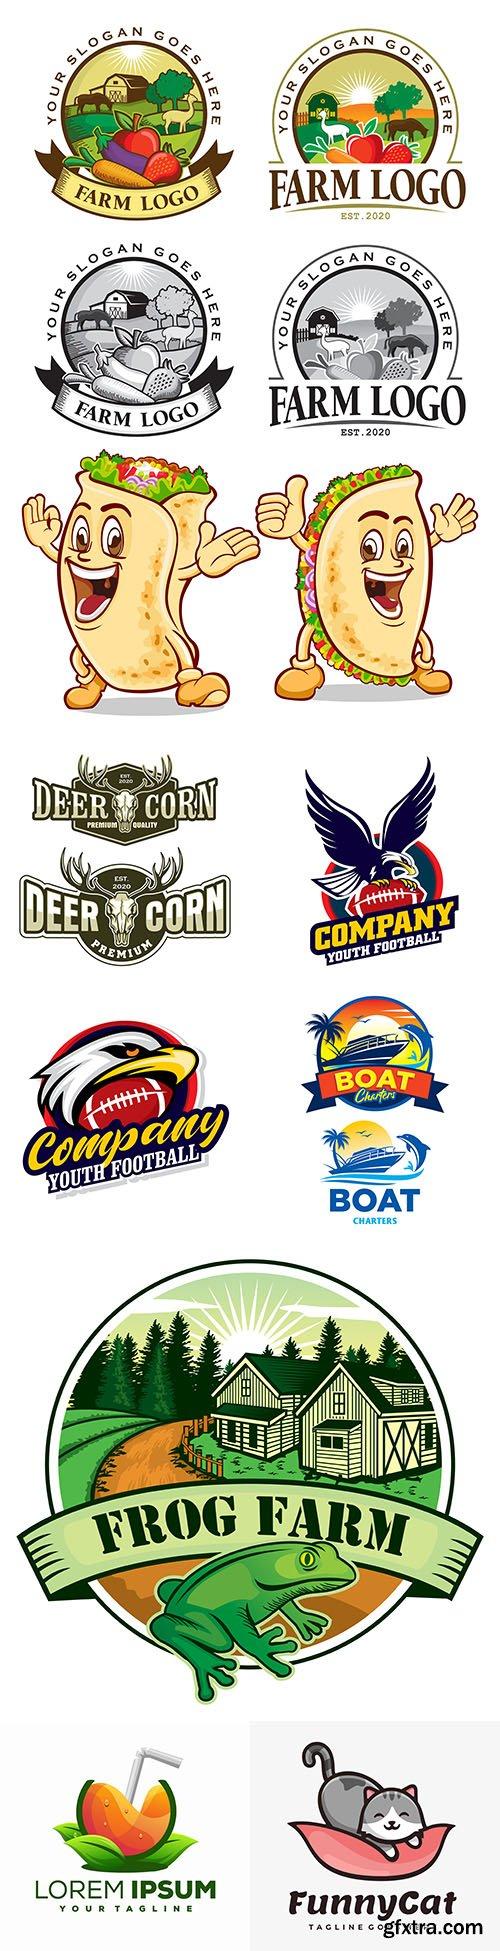 Brand name company logos business corporate design 71